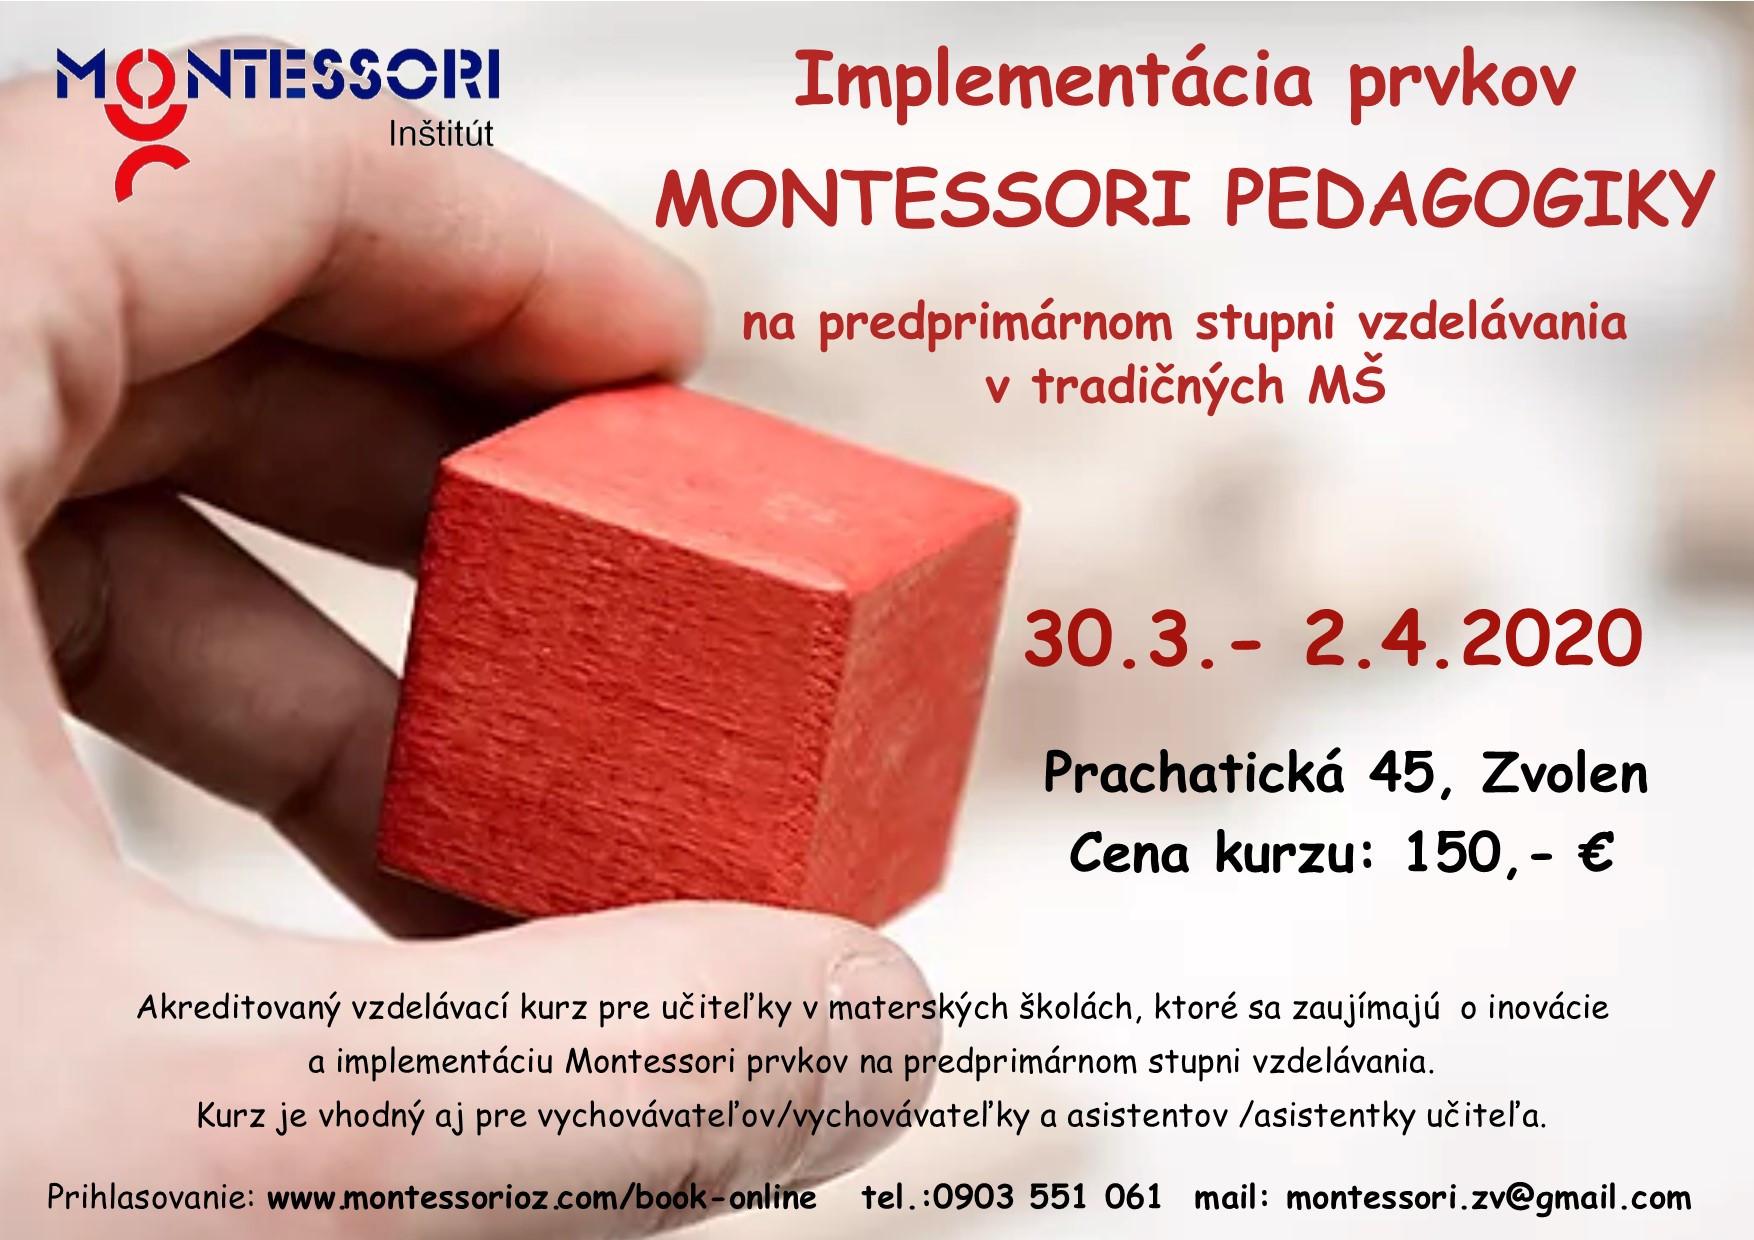 Implementácia prvkov Montessori